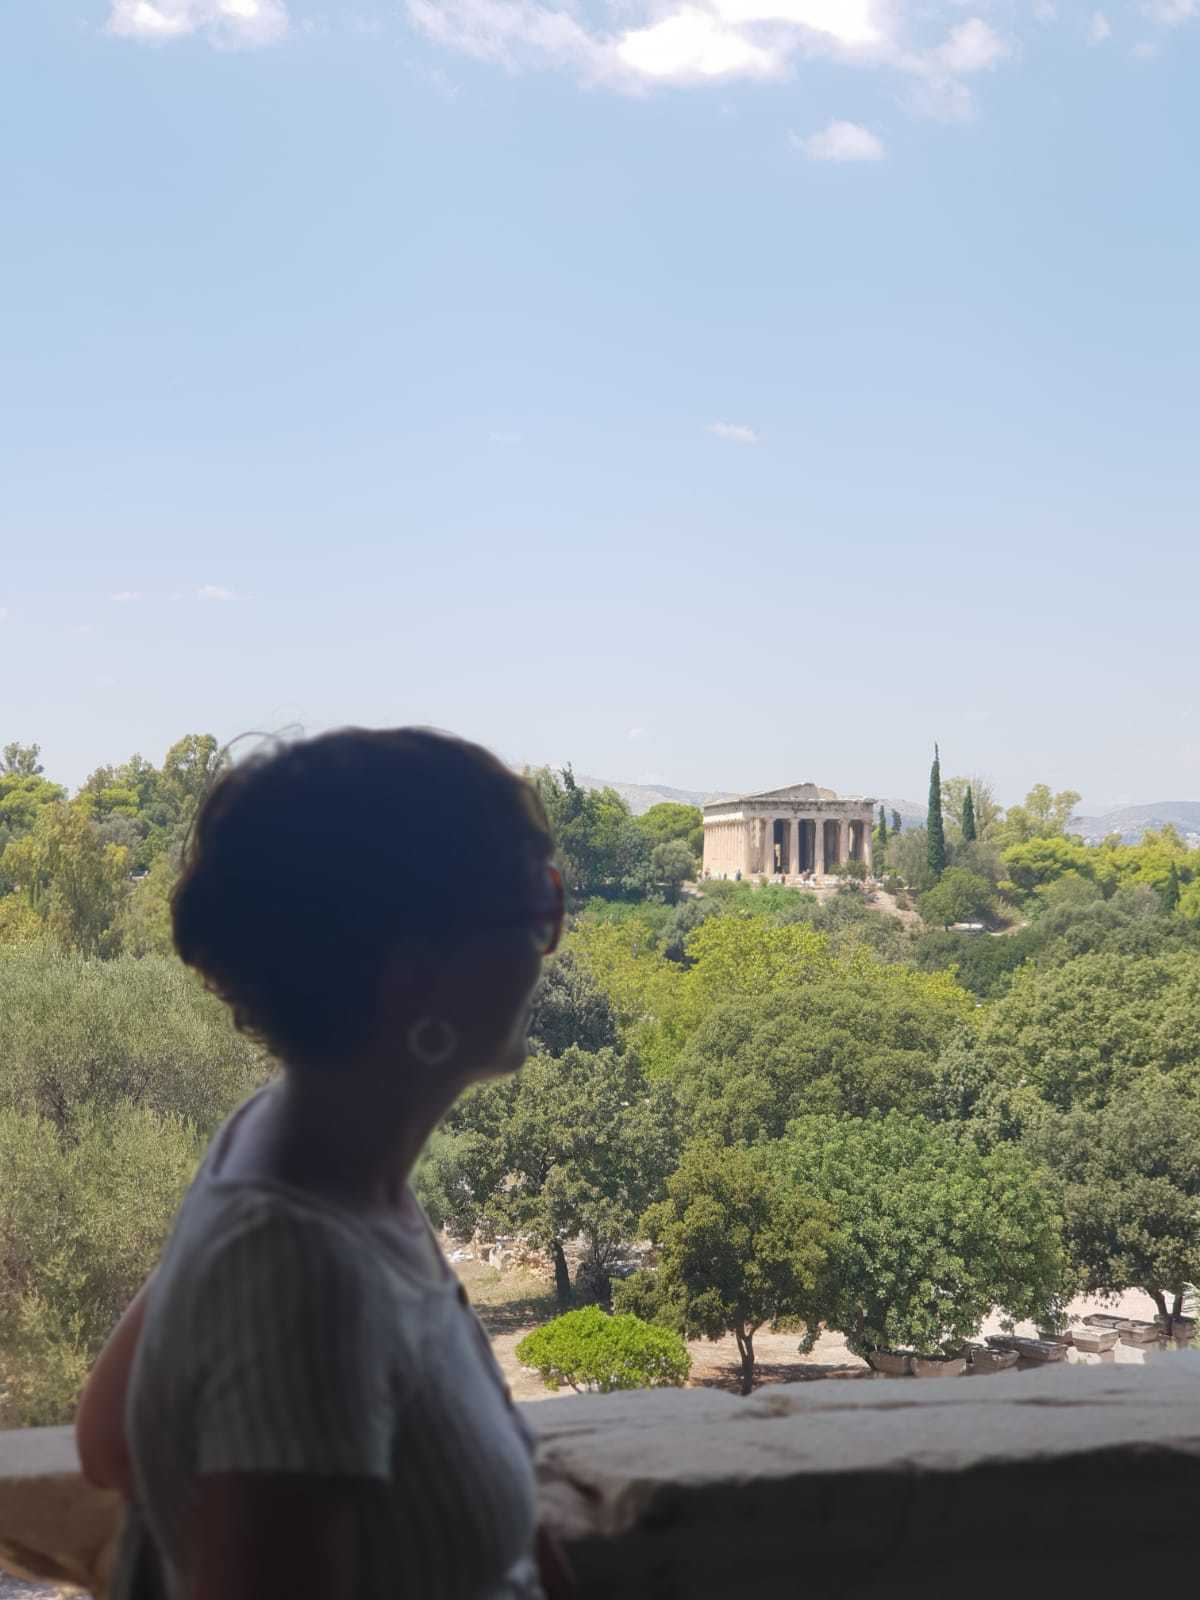 vistas-templo-griego